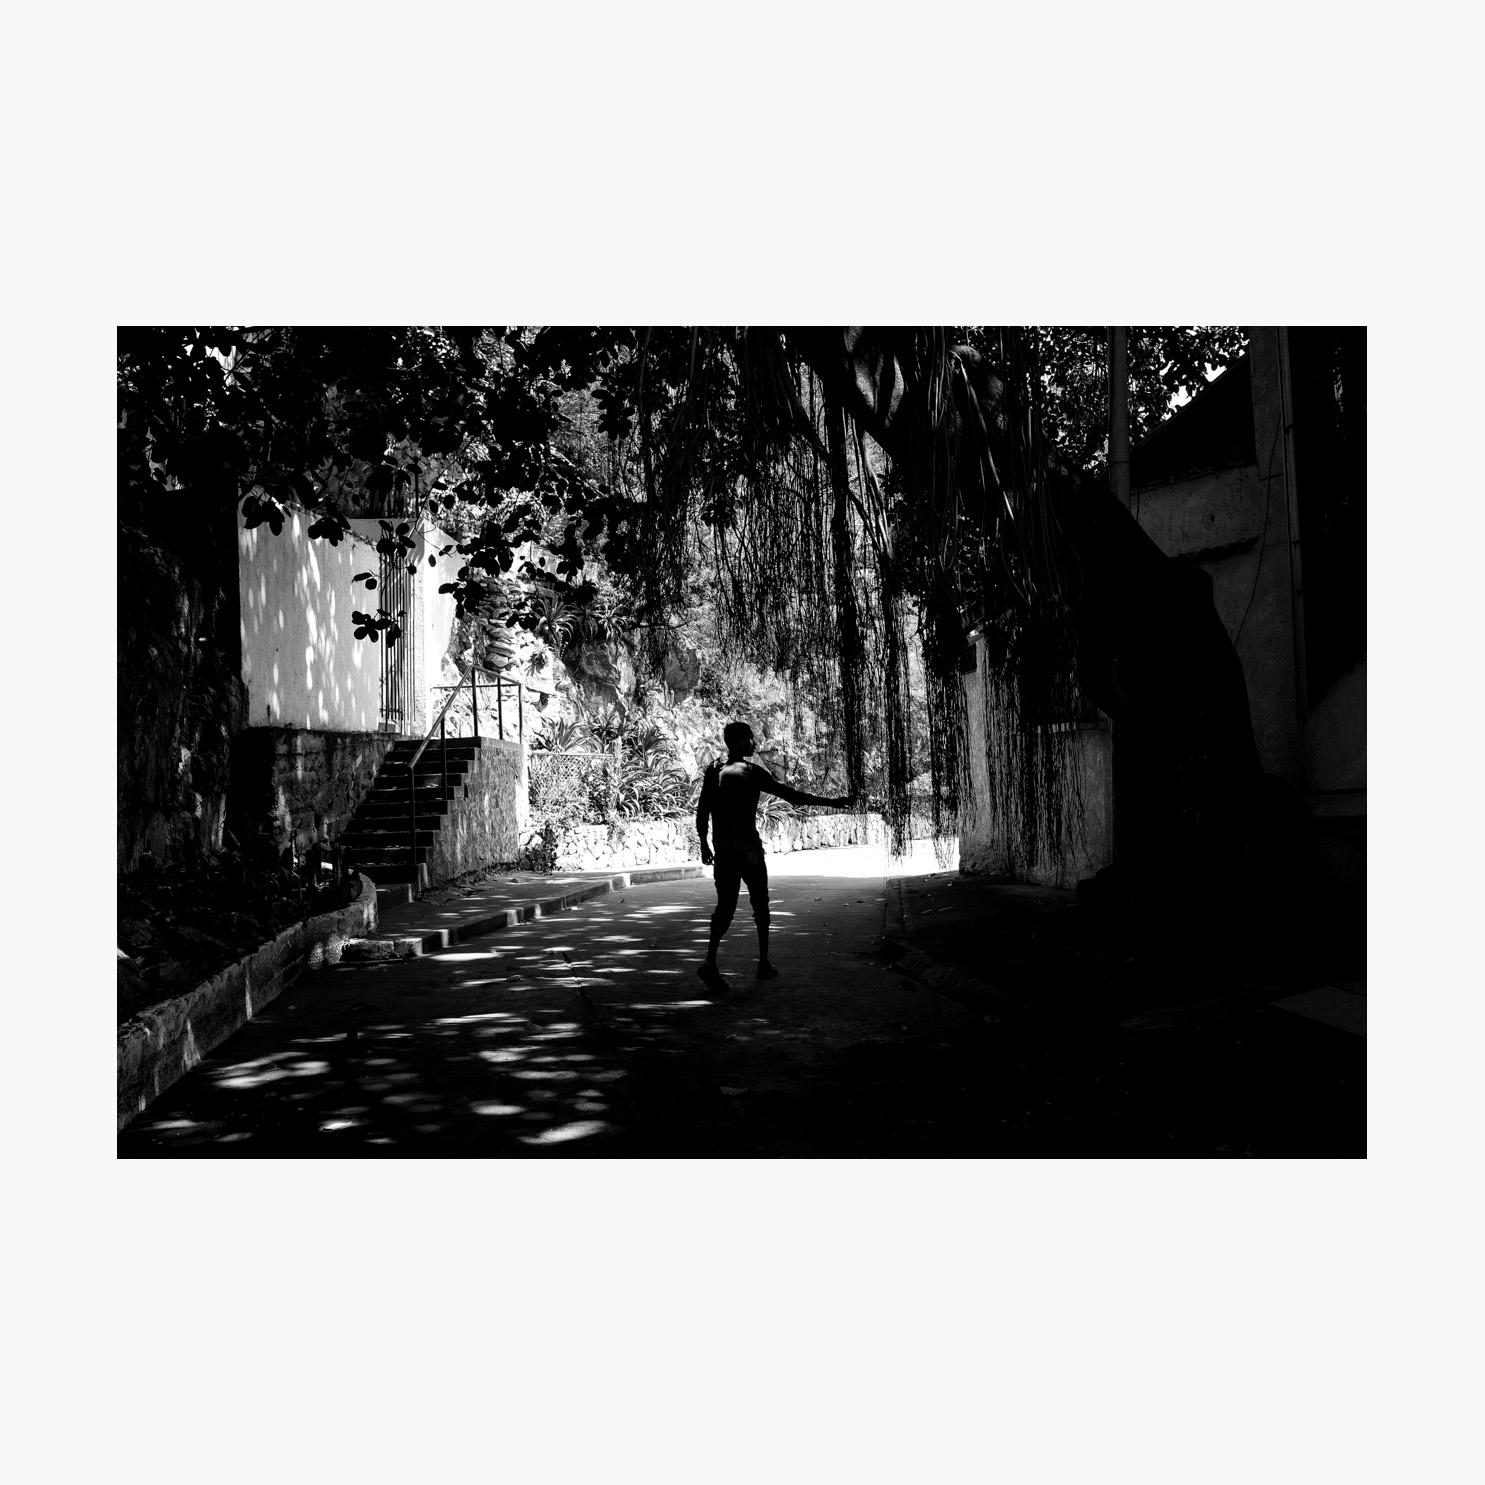 ©-2018-Harry-W-Edmonds-London-Photographer-The-Long-Road-PN04.jpg